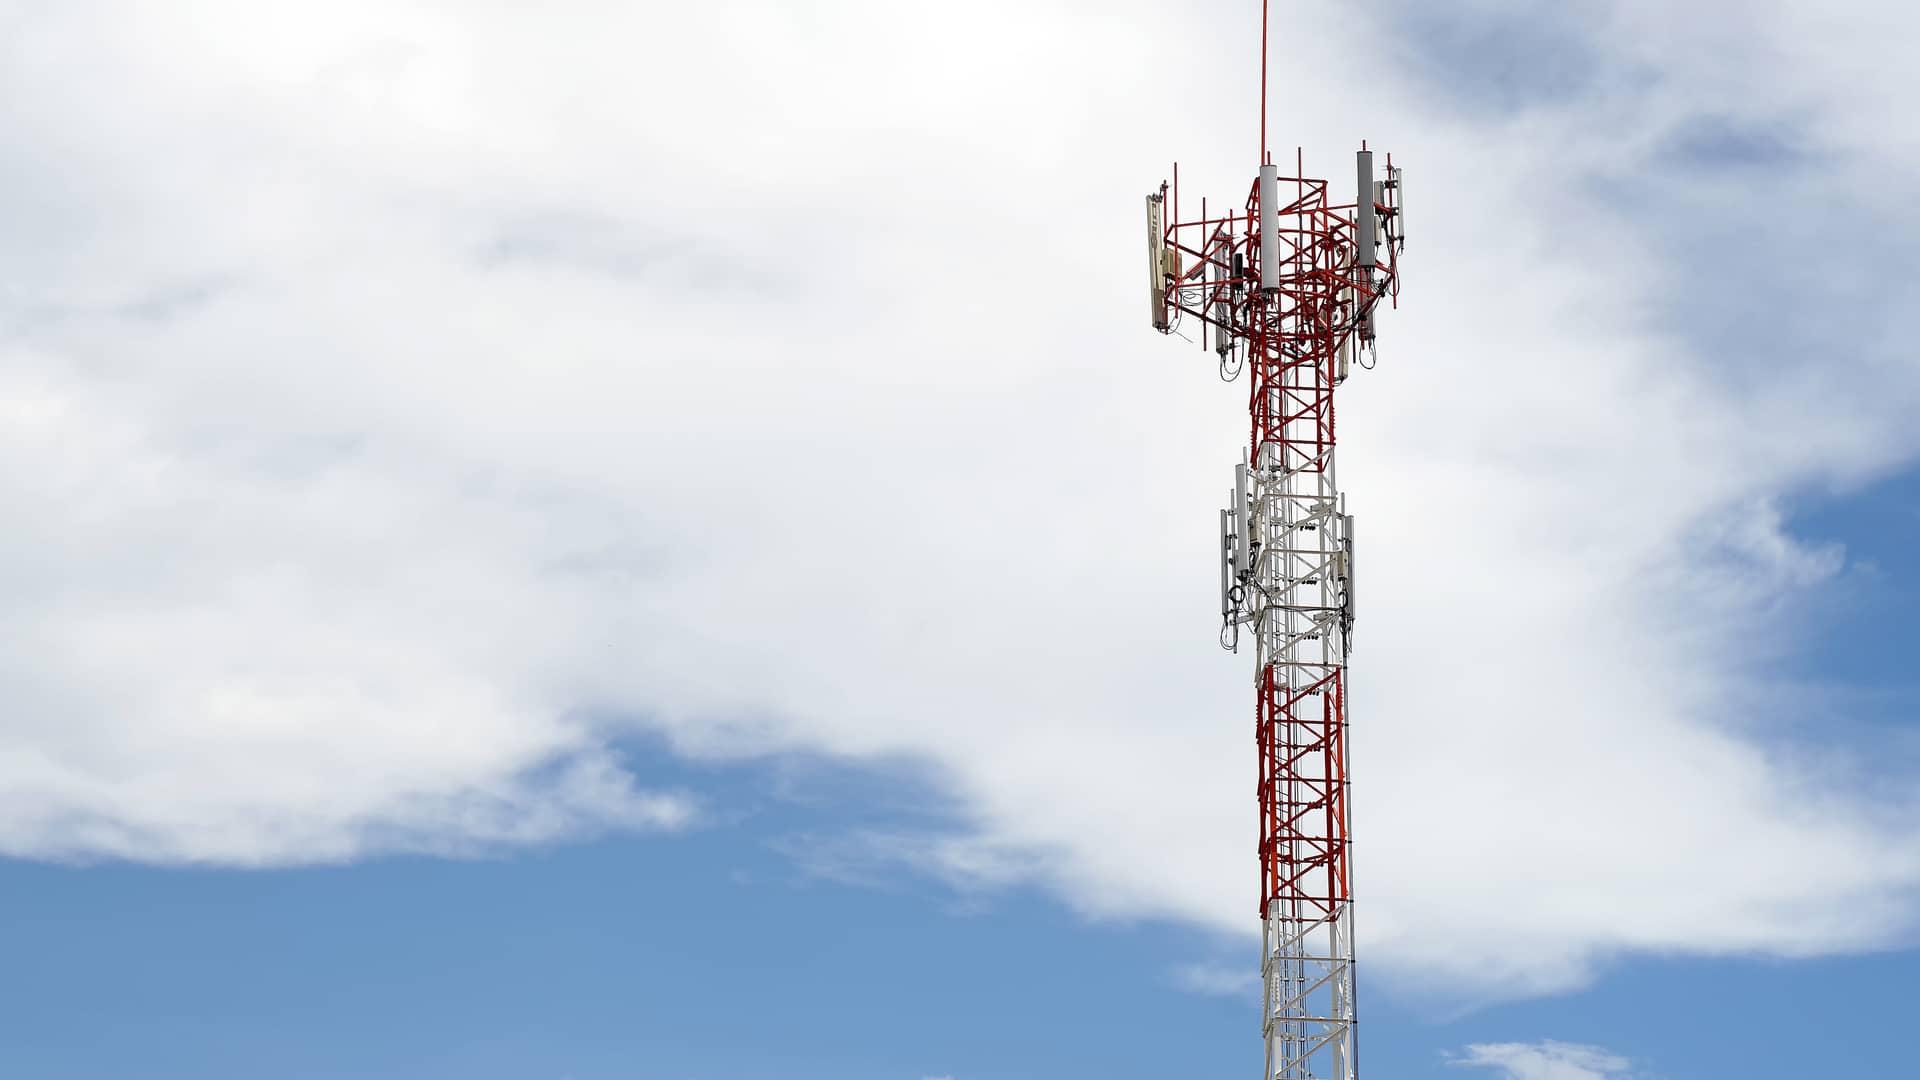 Fondo de cielo de torre de telecomunicaciones representa cobertura 5g de lowi